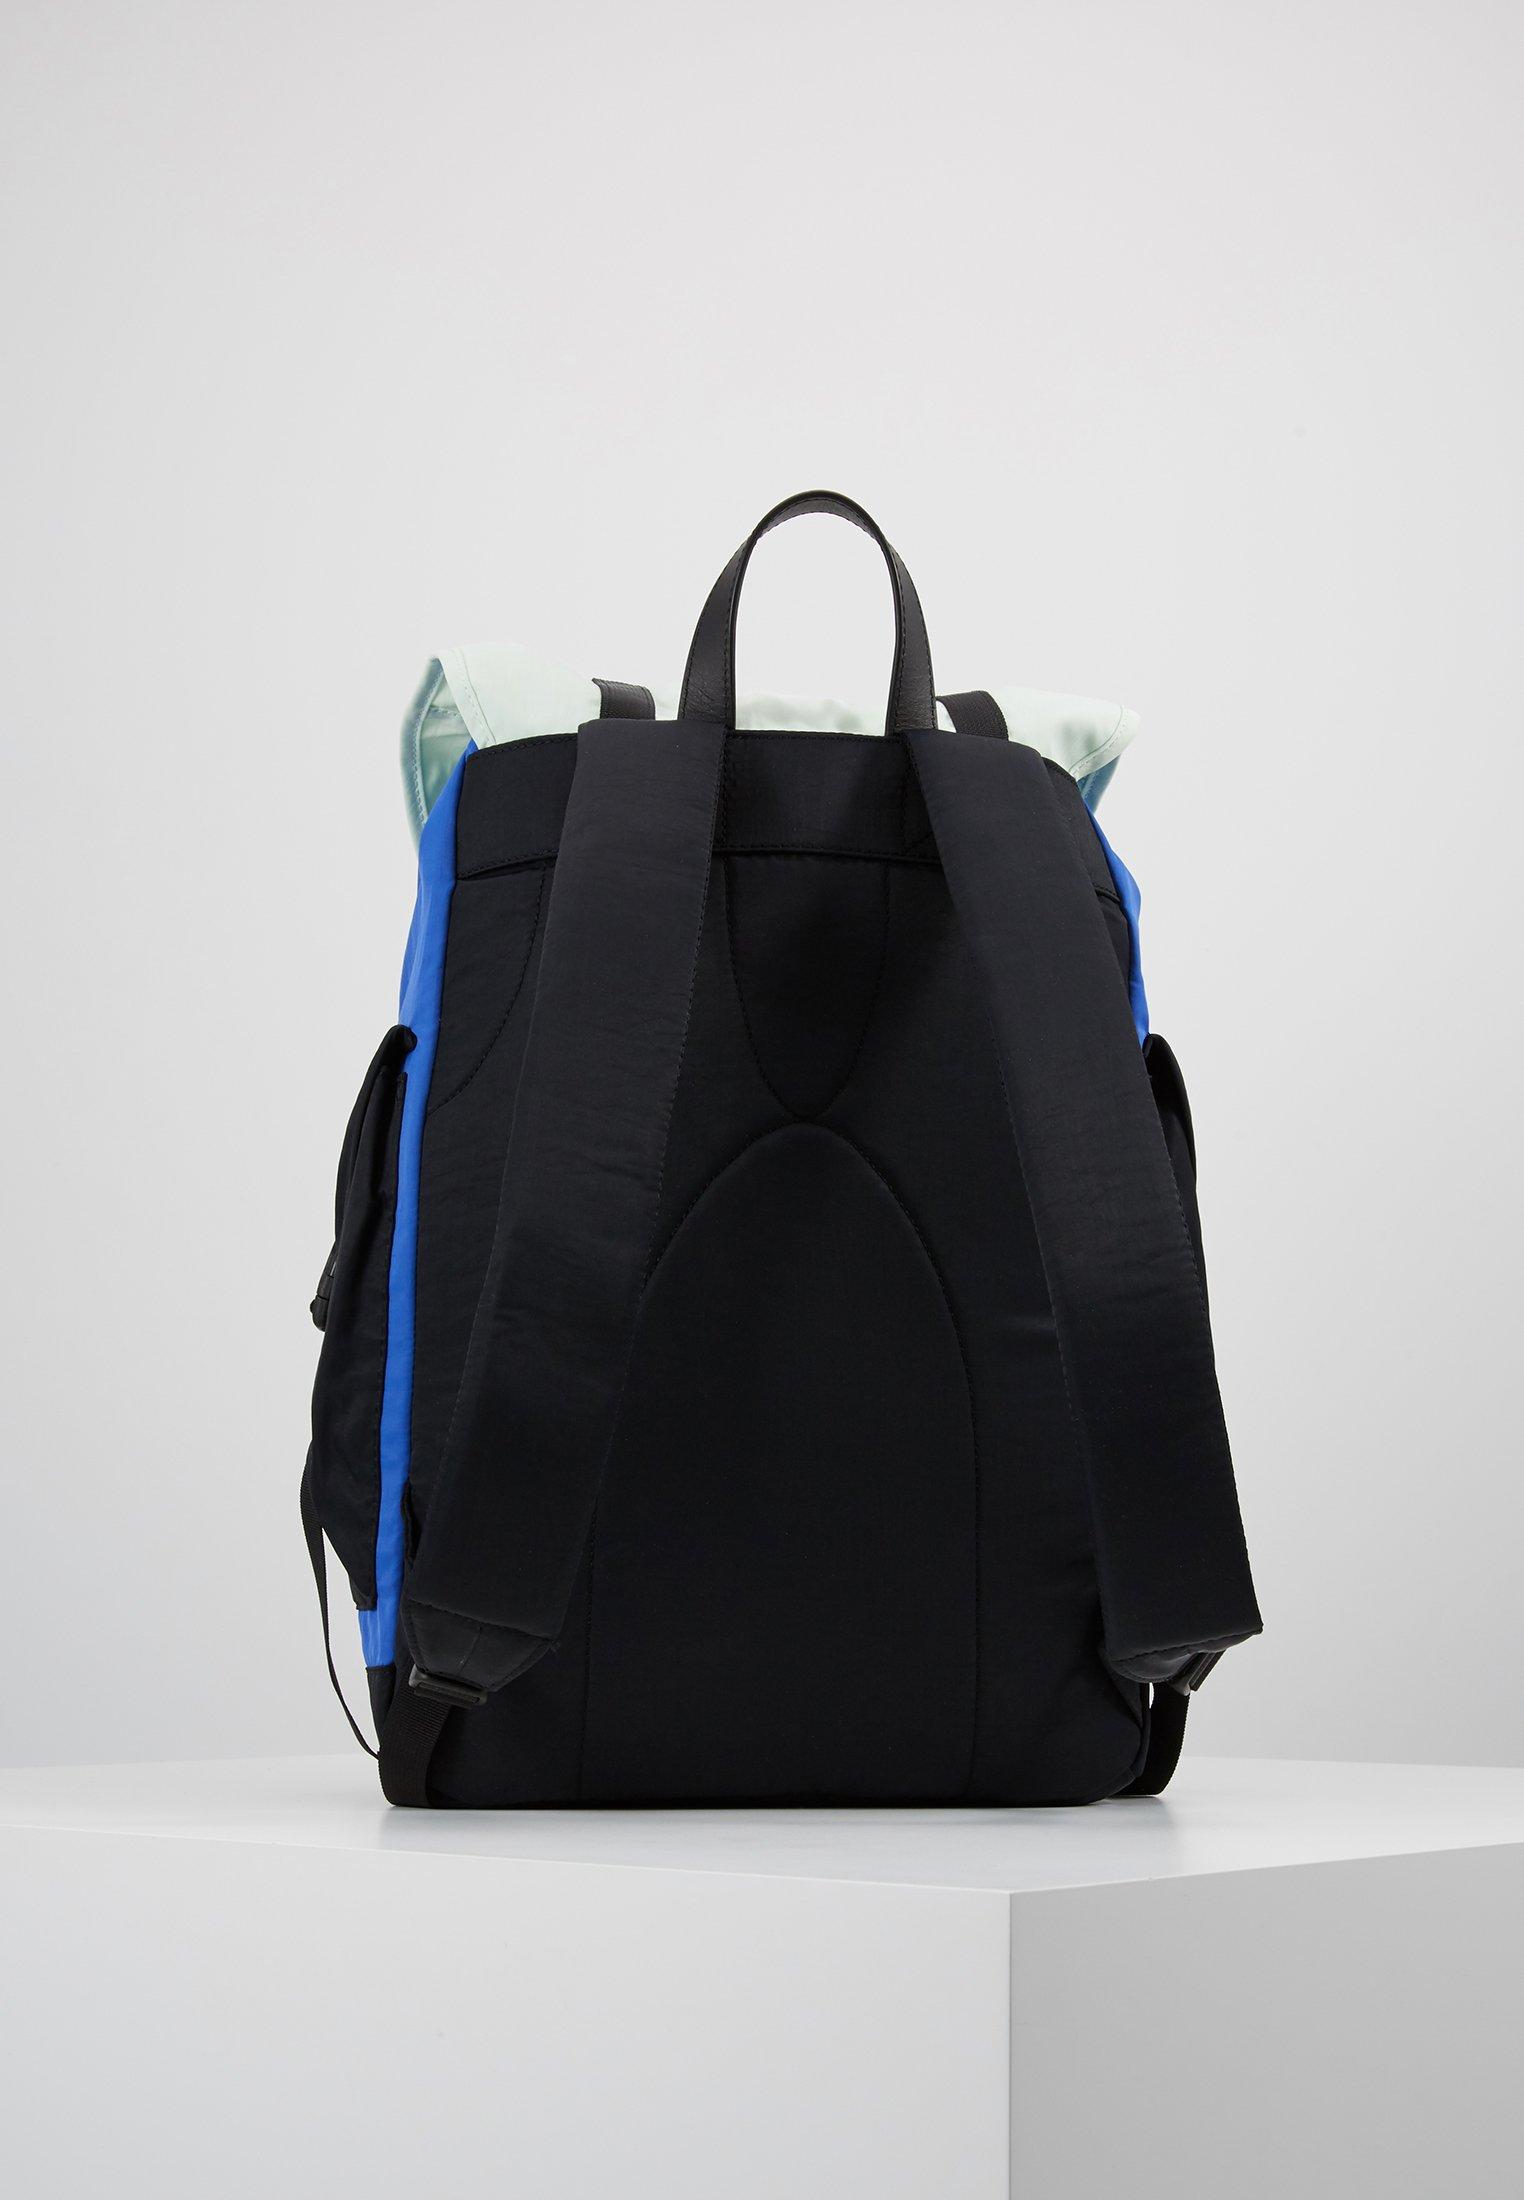 Recomendar barato Sandqvist CHARLIE - Mochila - blue/green/black | Complementos para mujer 2020 5OLJA